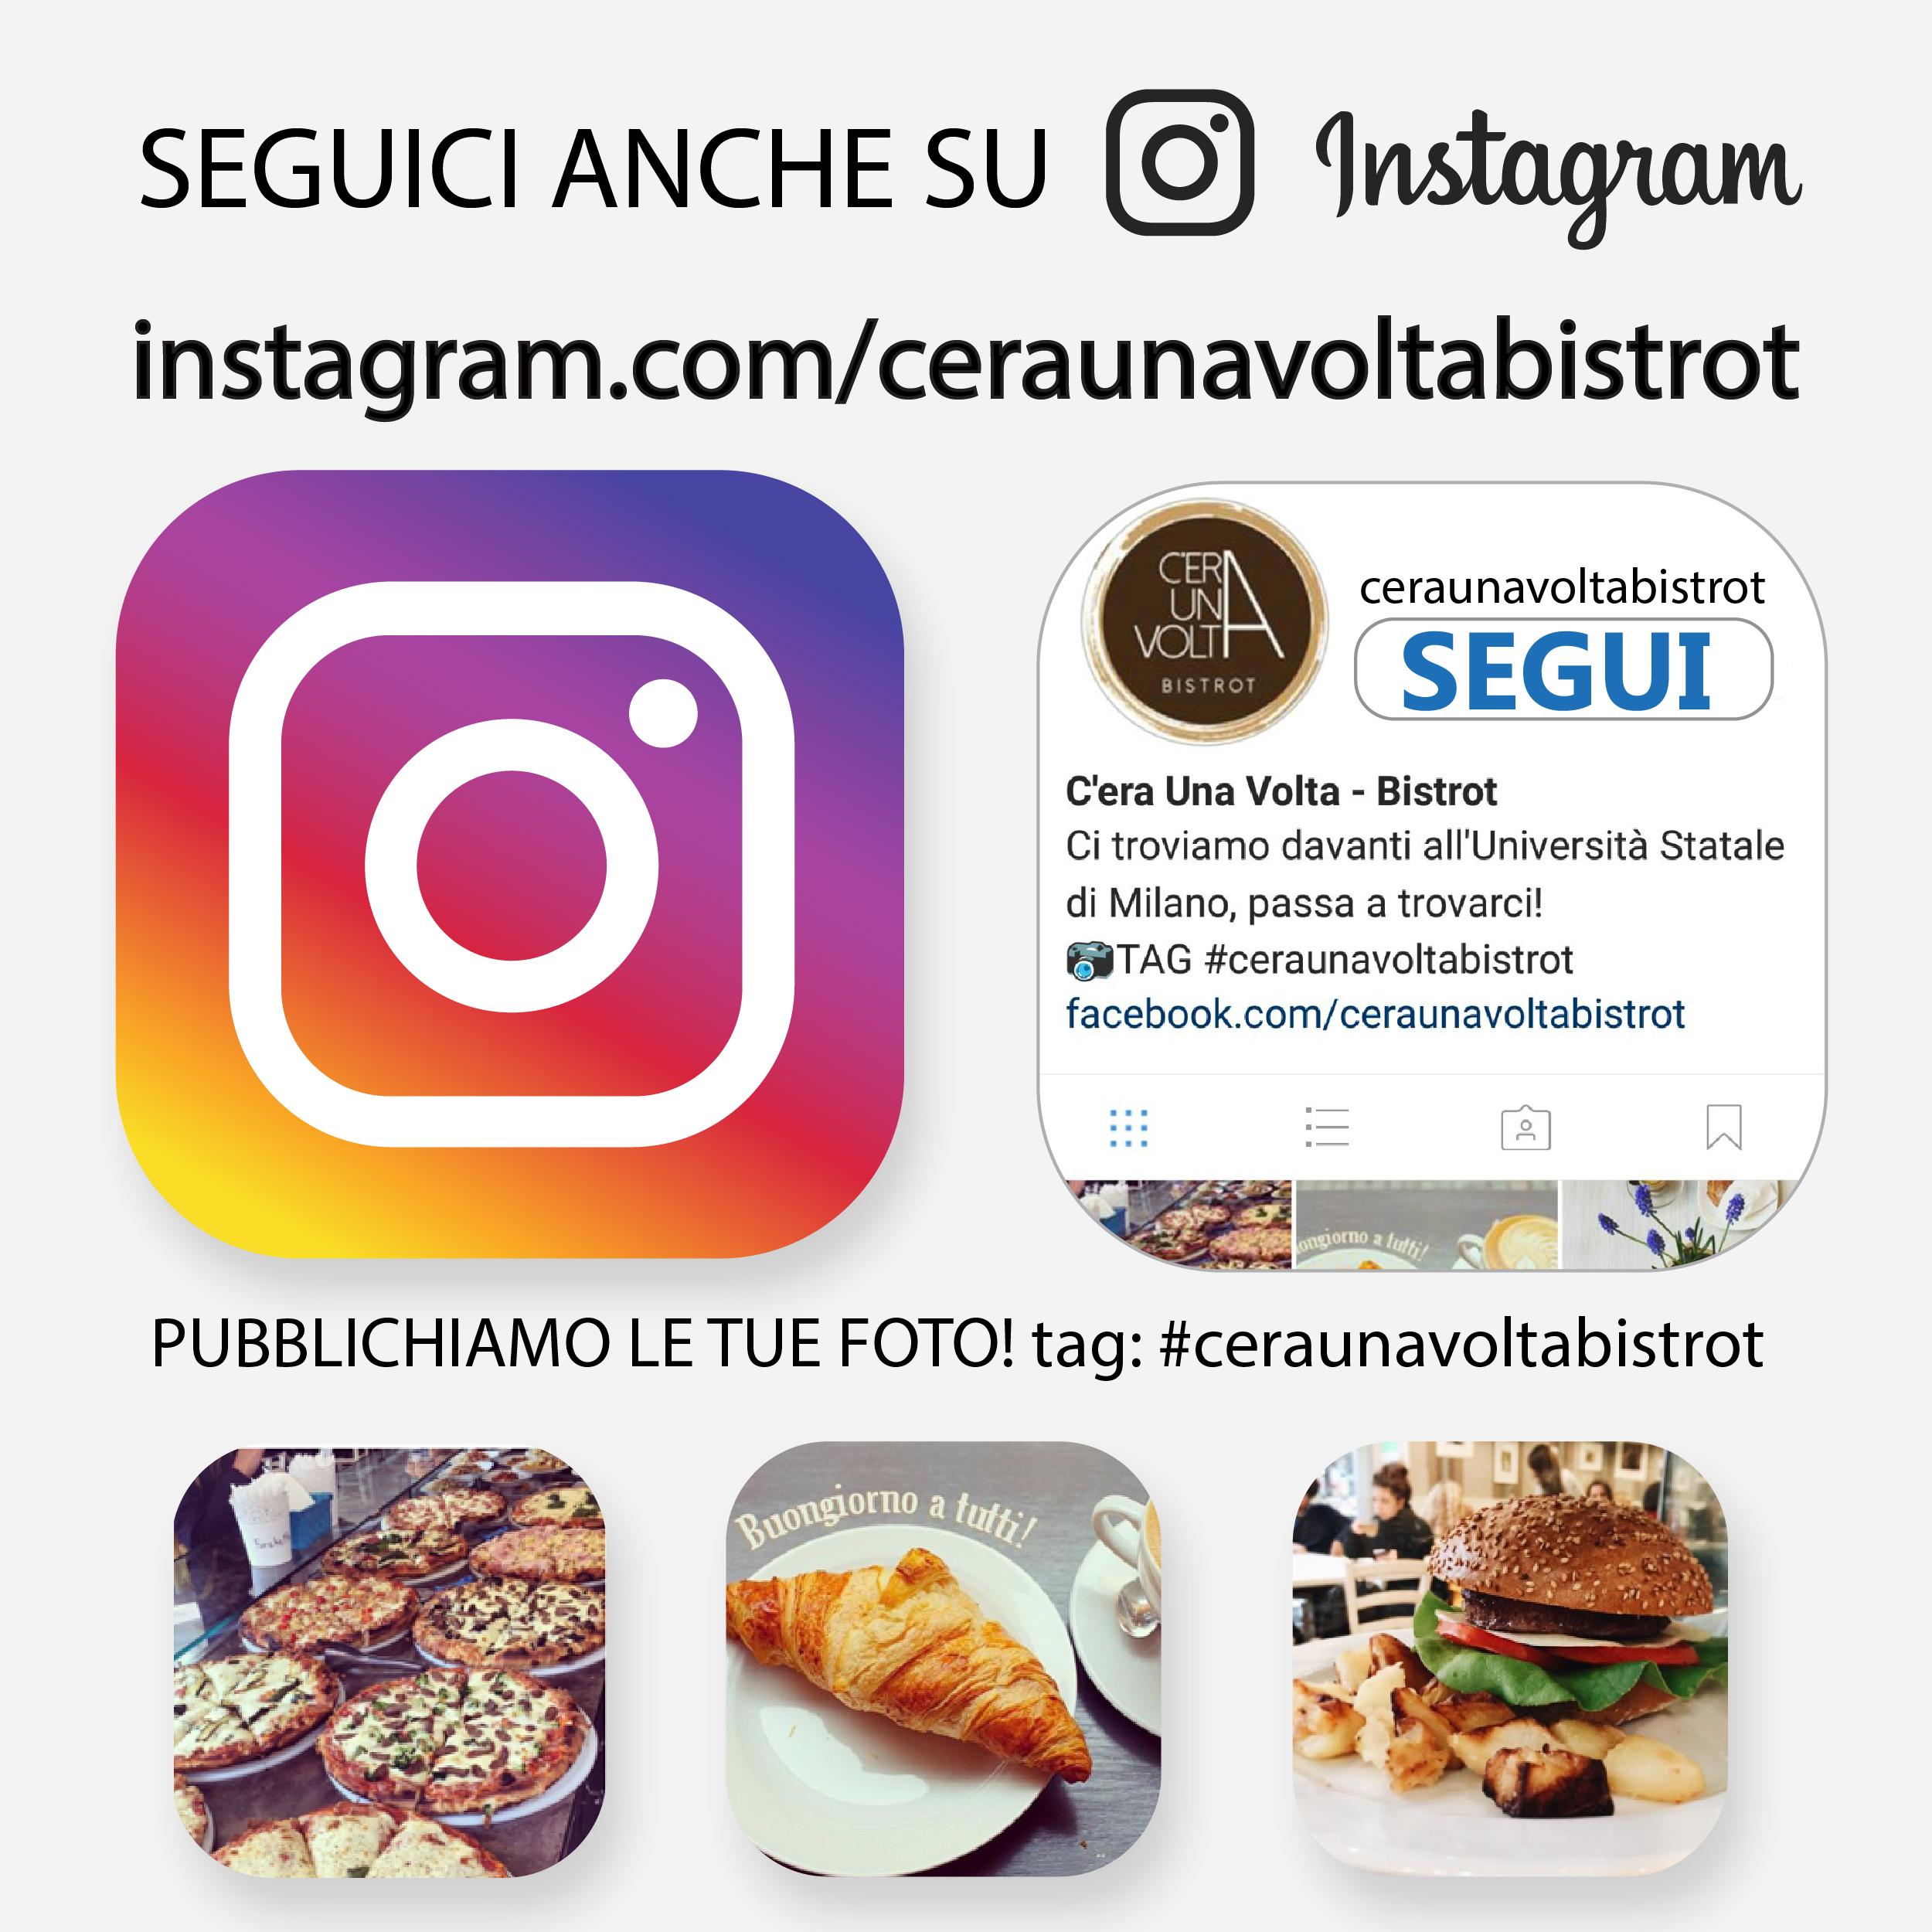 Il nostro Instagram